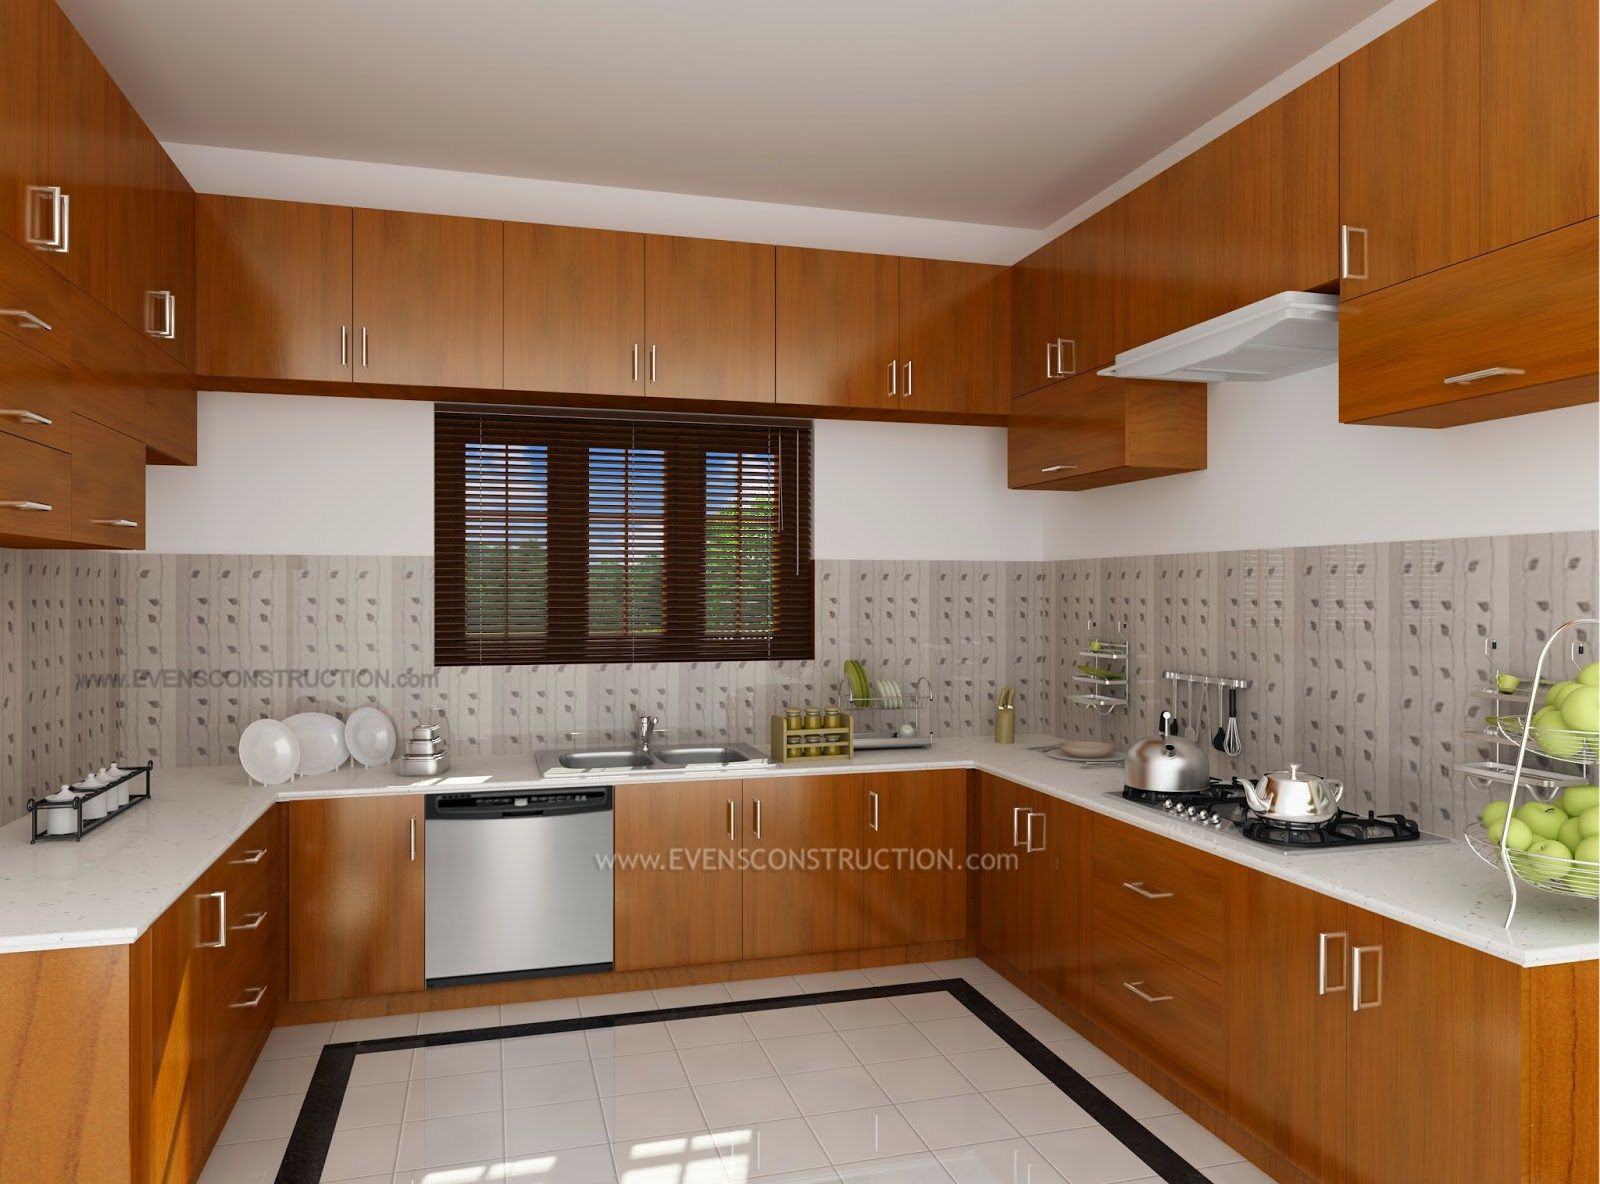 home kitchen design design interior kitchen home kerala modern house kitchen